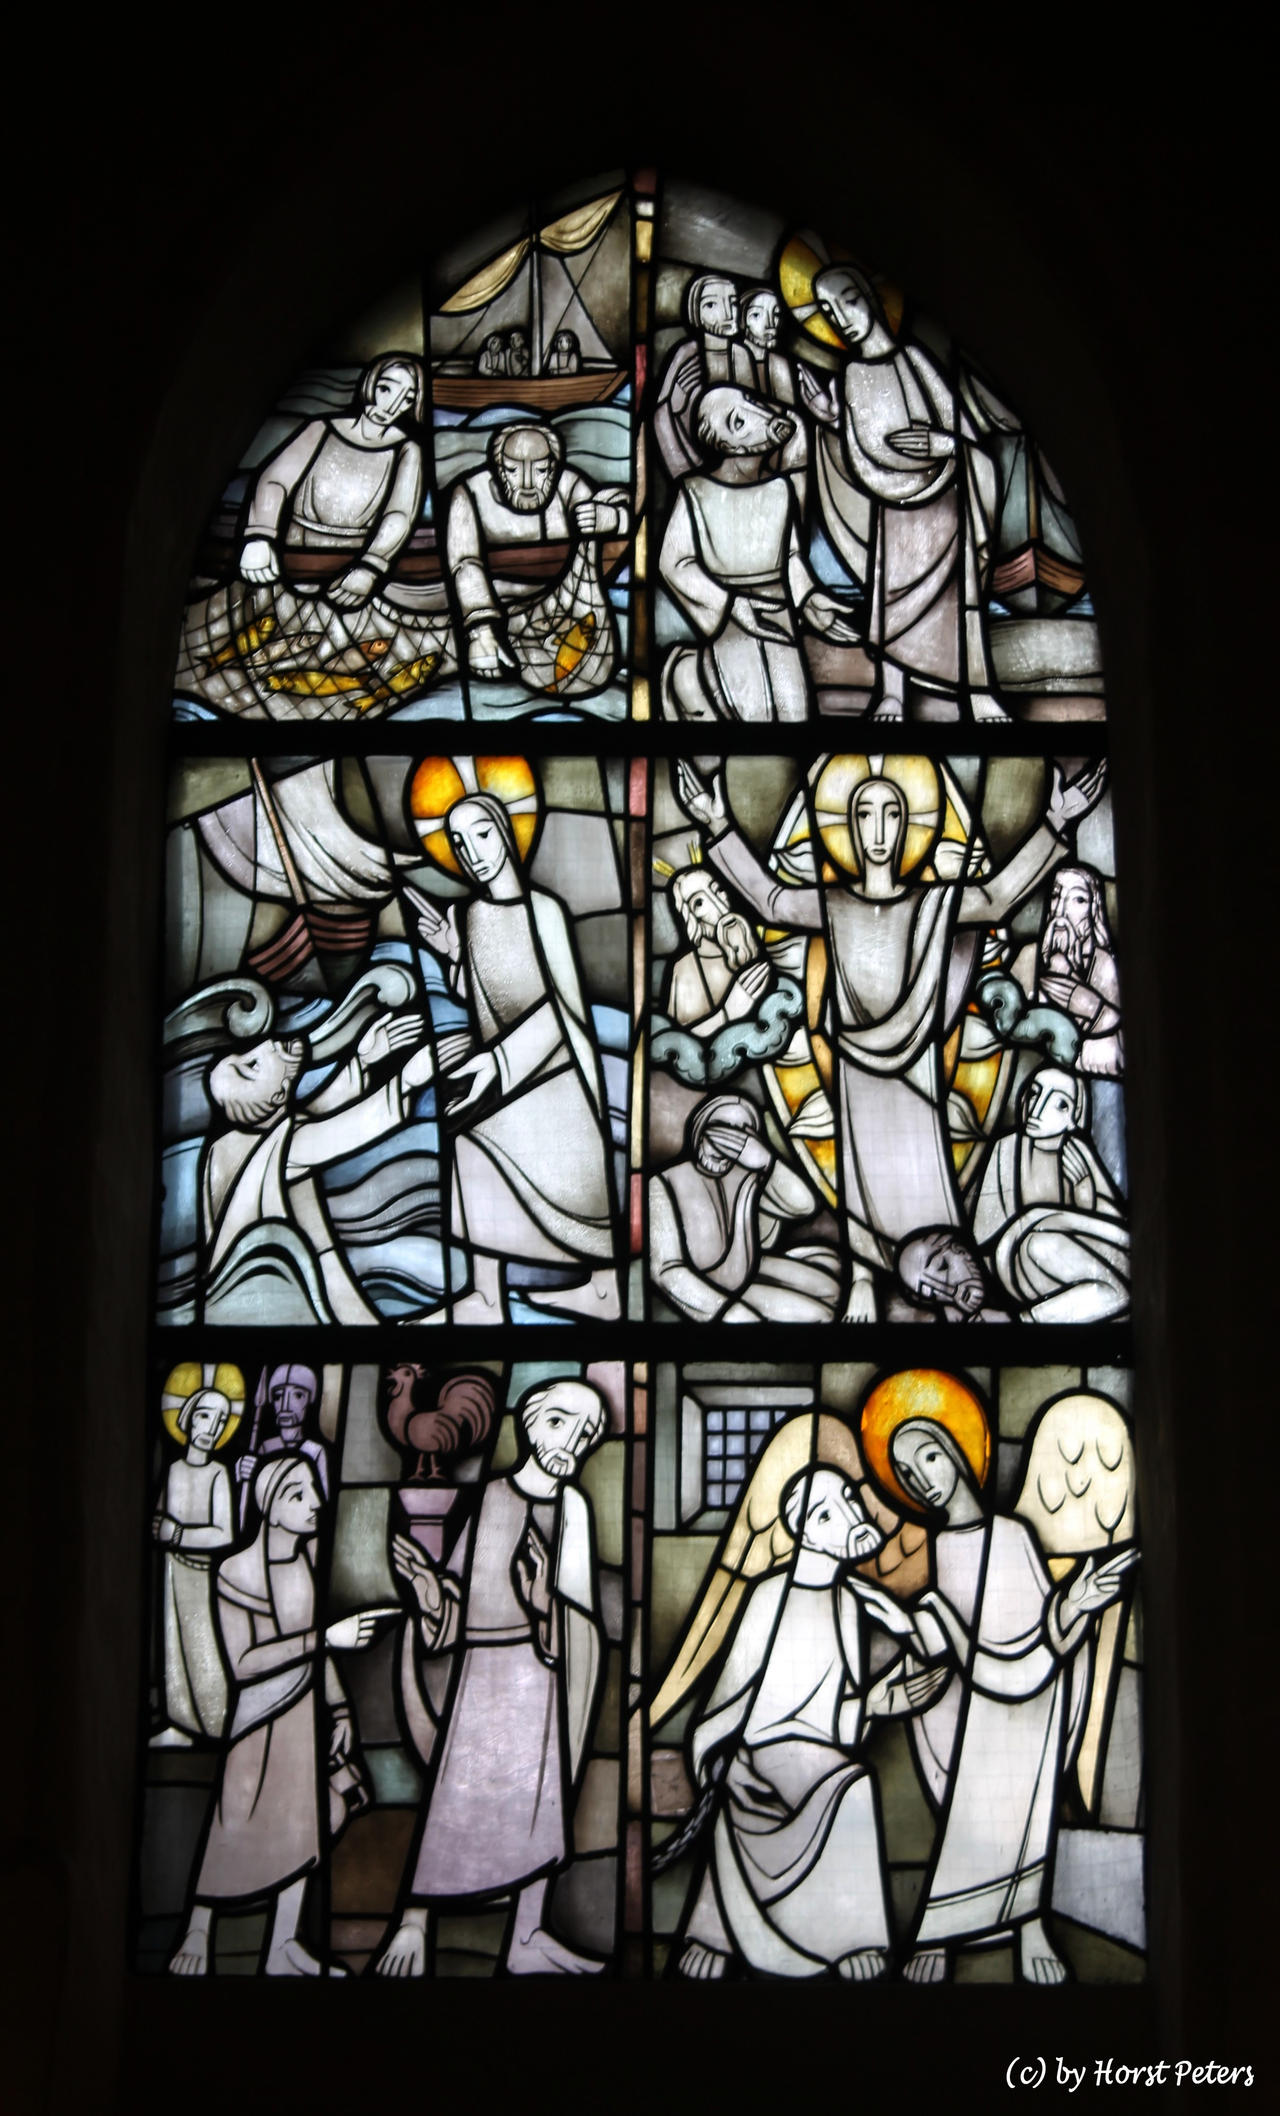 Church window 3 by bluesgrass